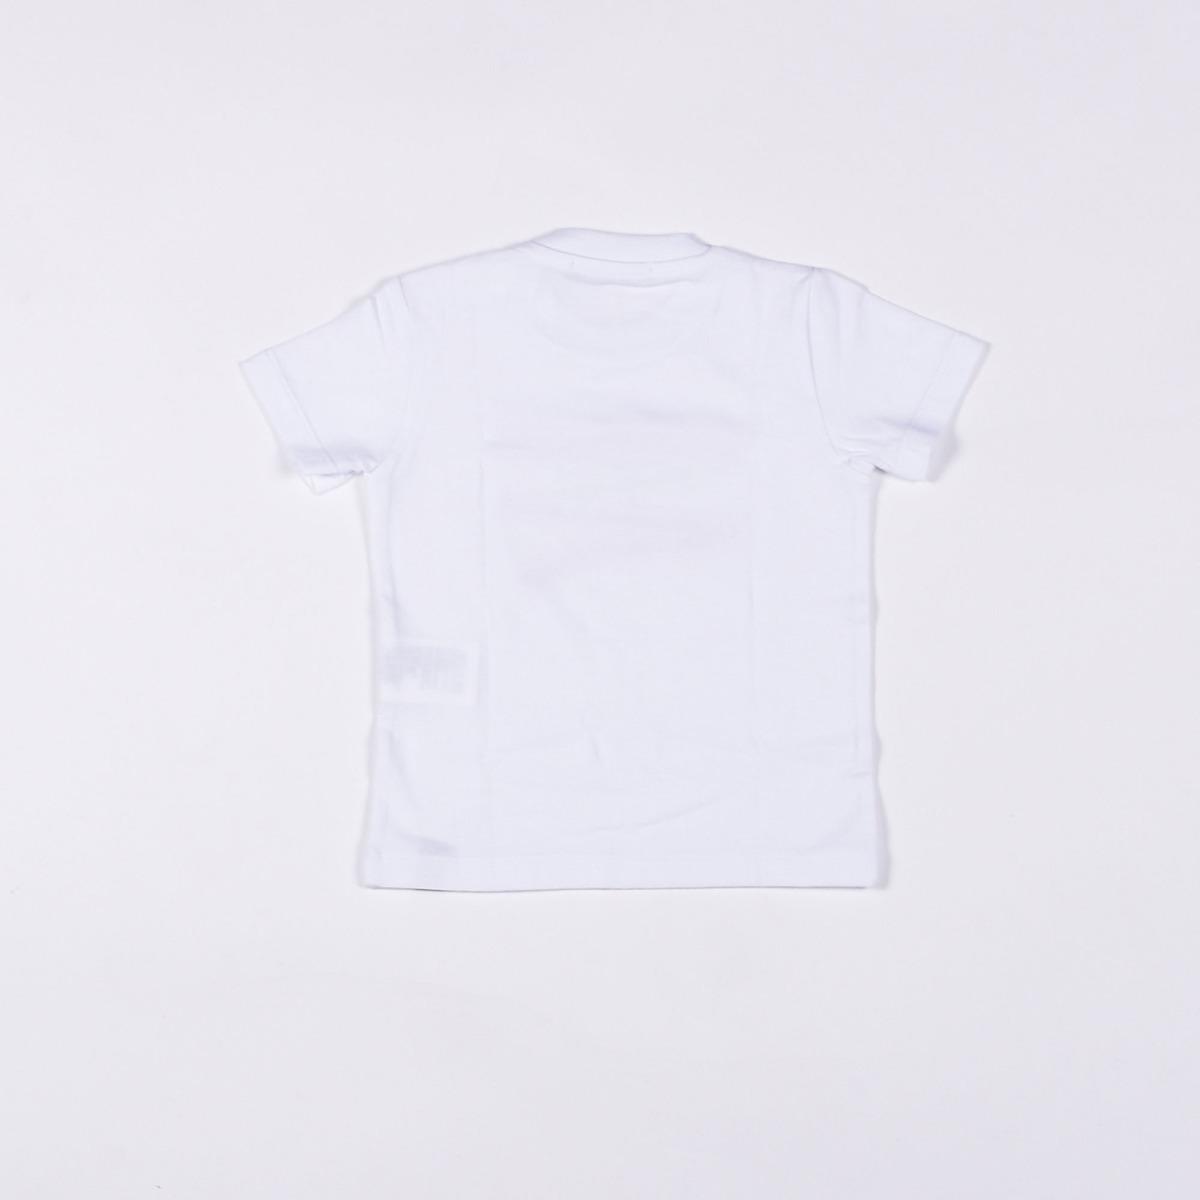 T-shirt con logo evidenziato - Bianca